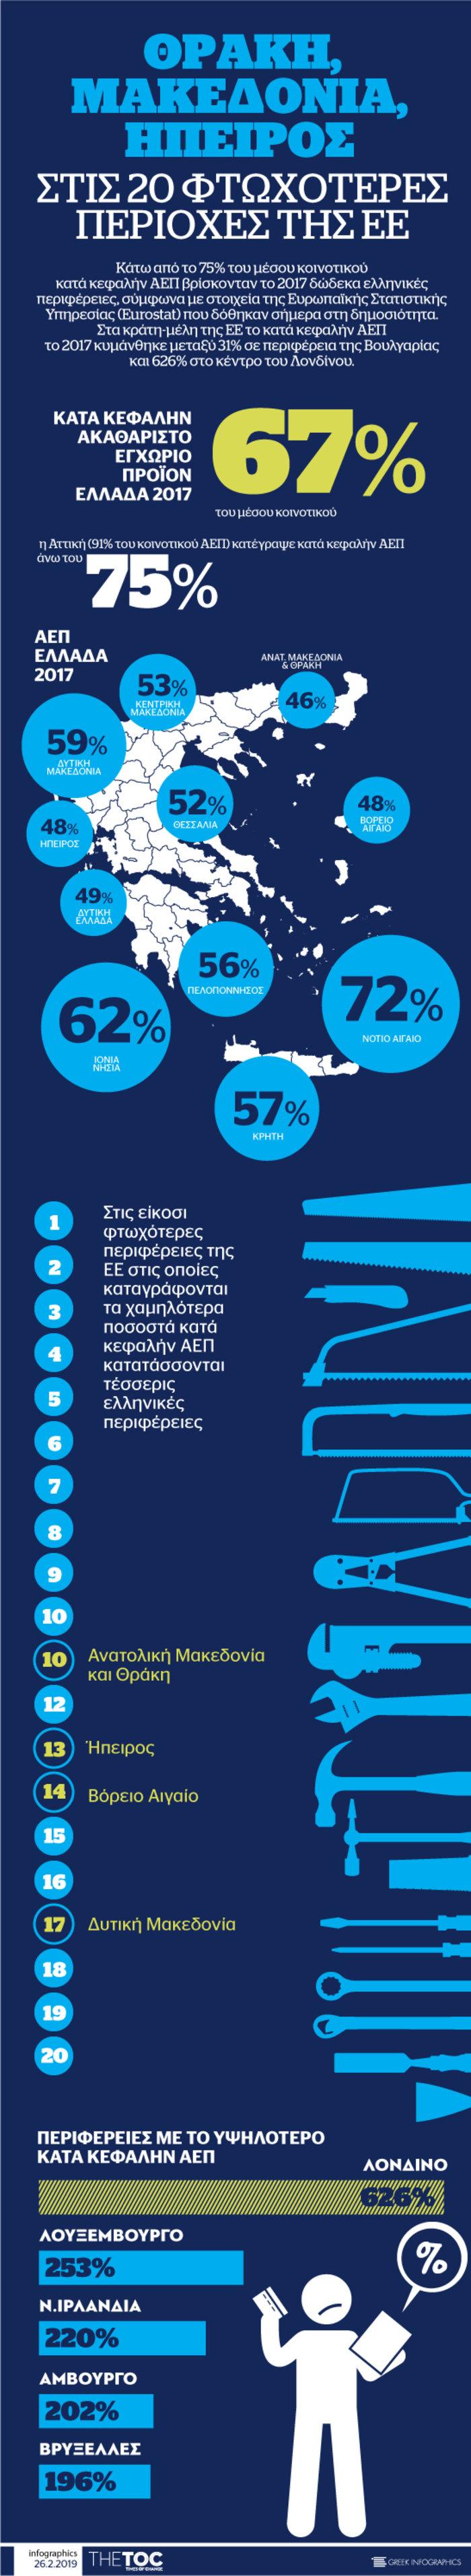 H συγκλονιστική έρευνα της Eurostat σε ένα infographic